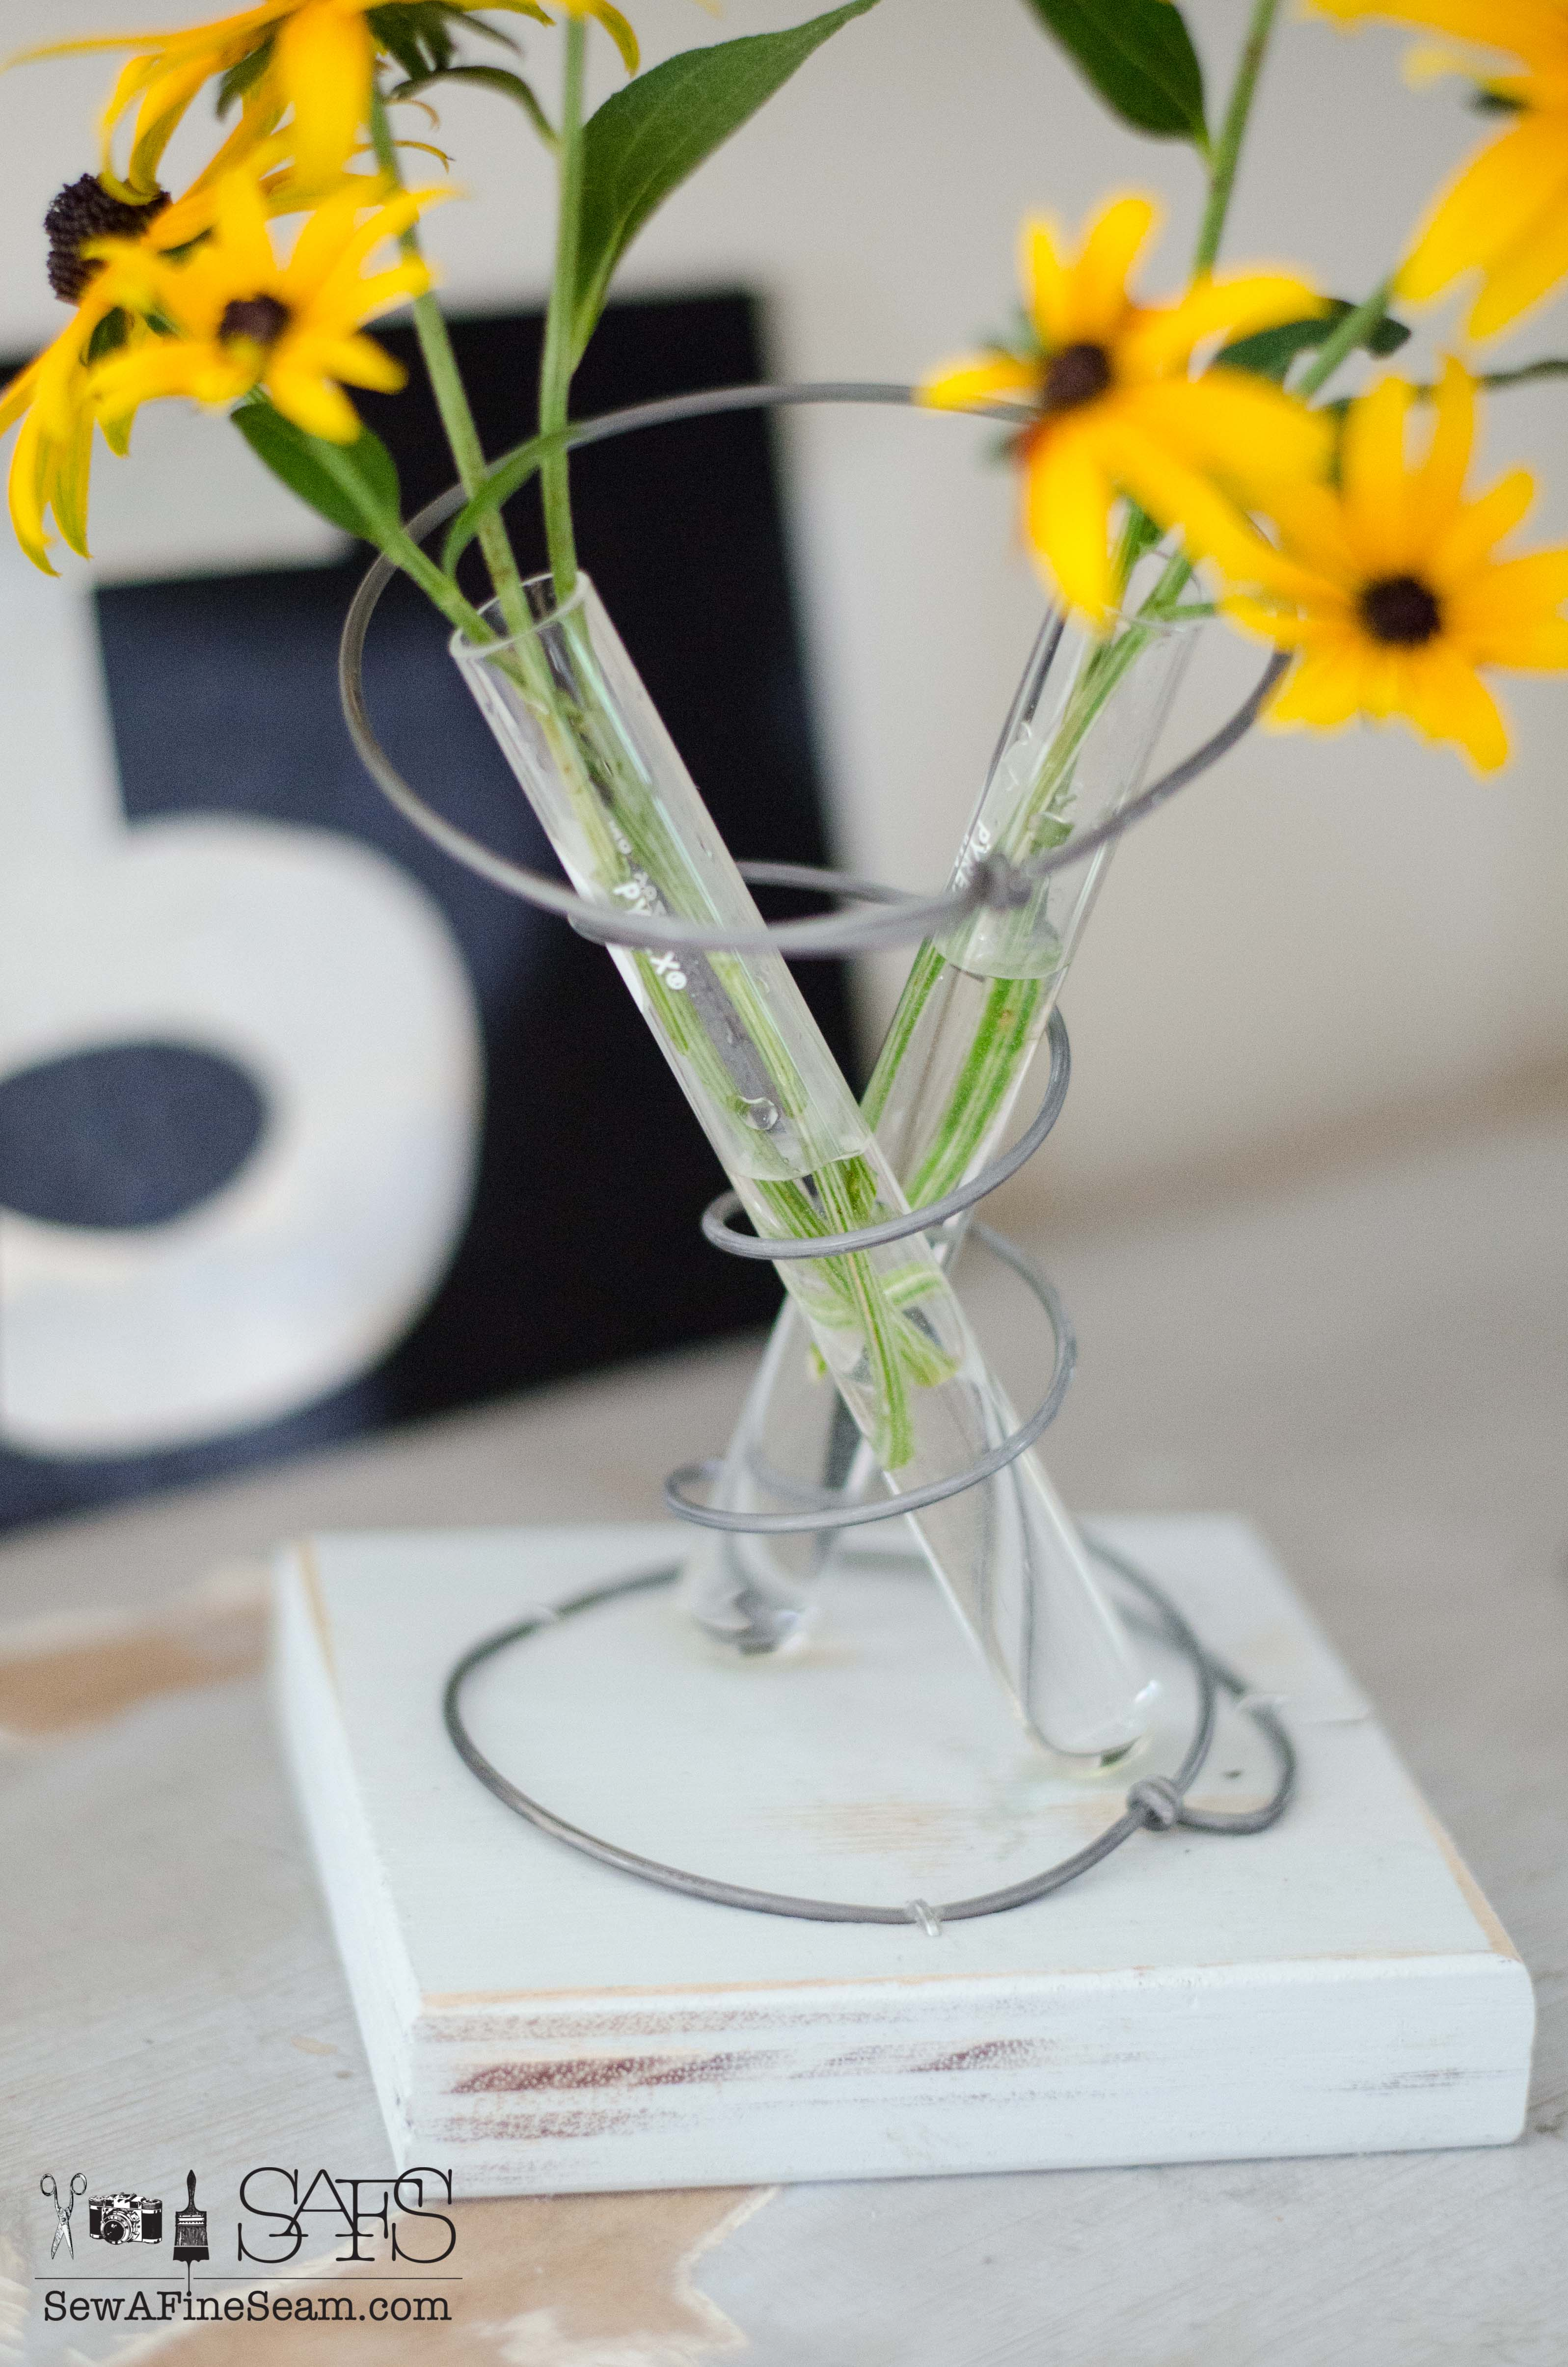 Test Tubes And Bedspring Flower Vase Sew A Fine Seam